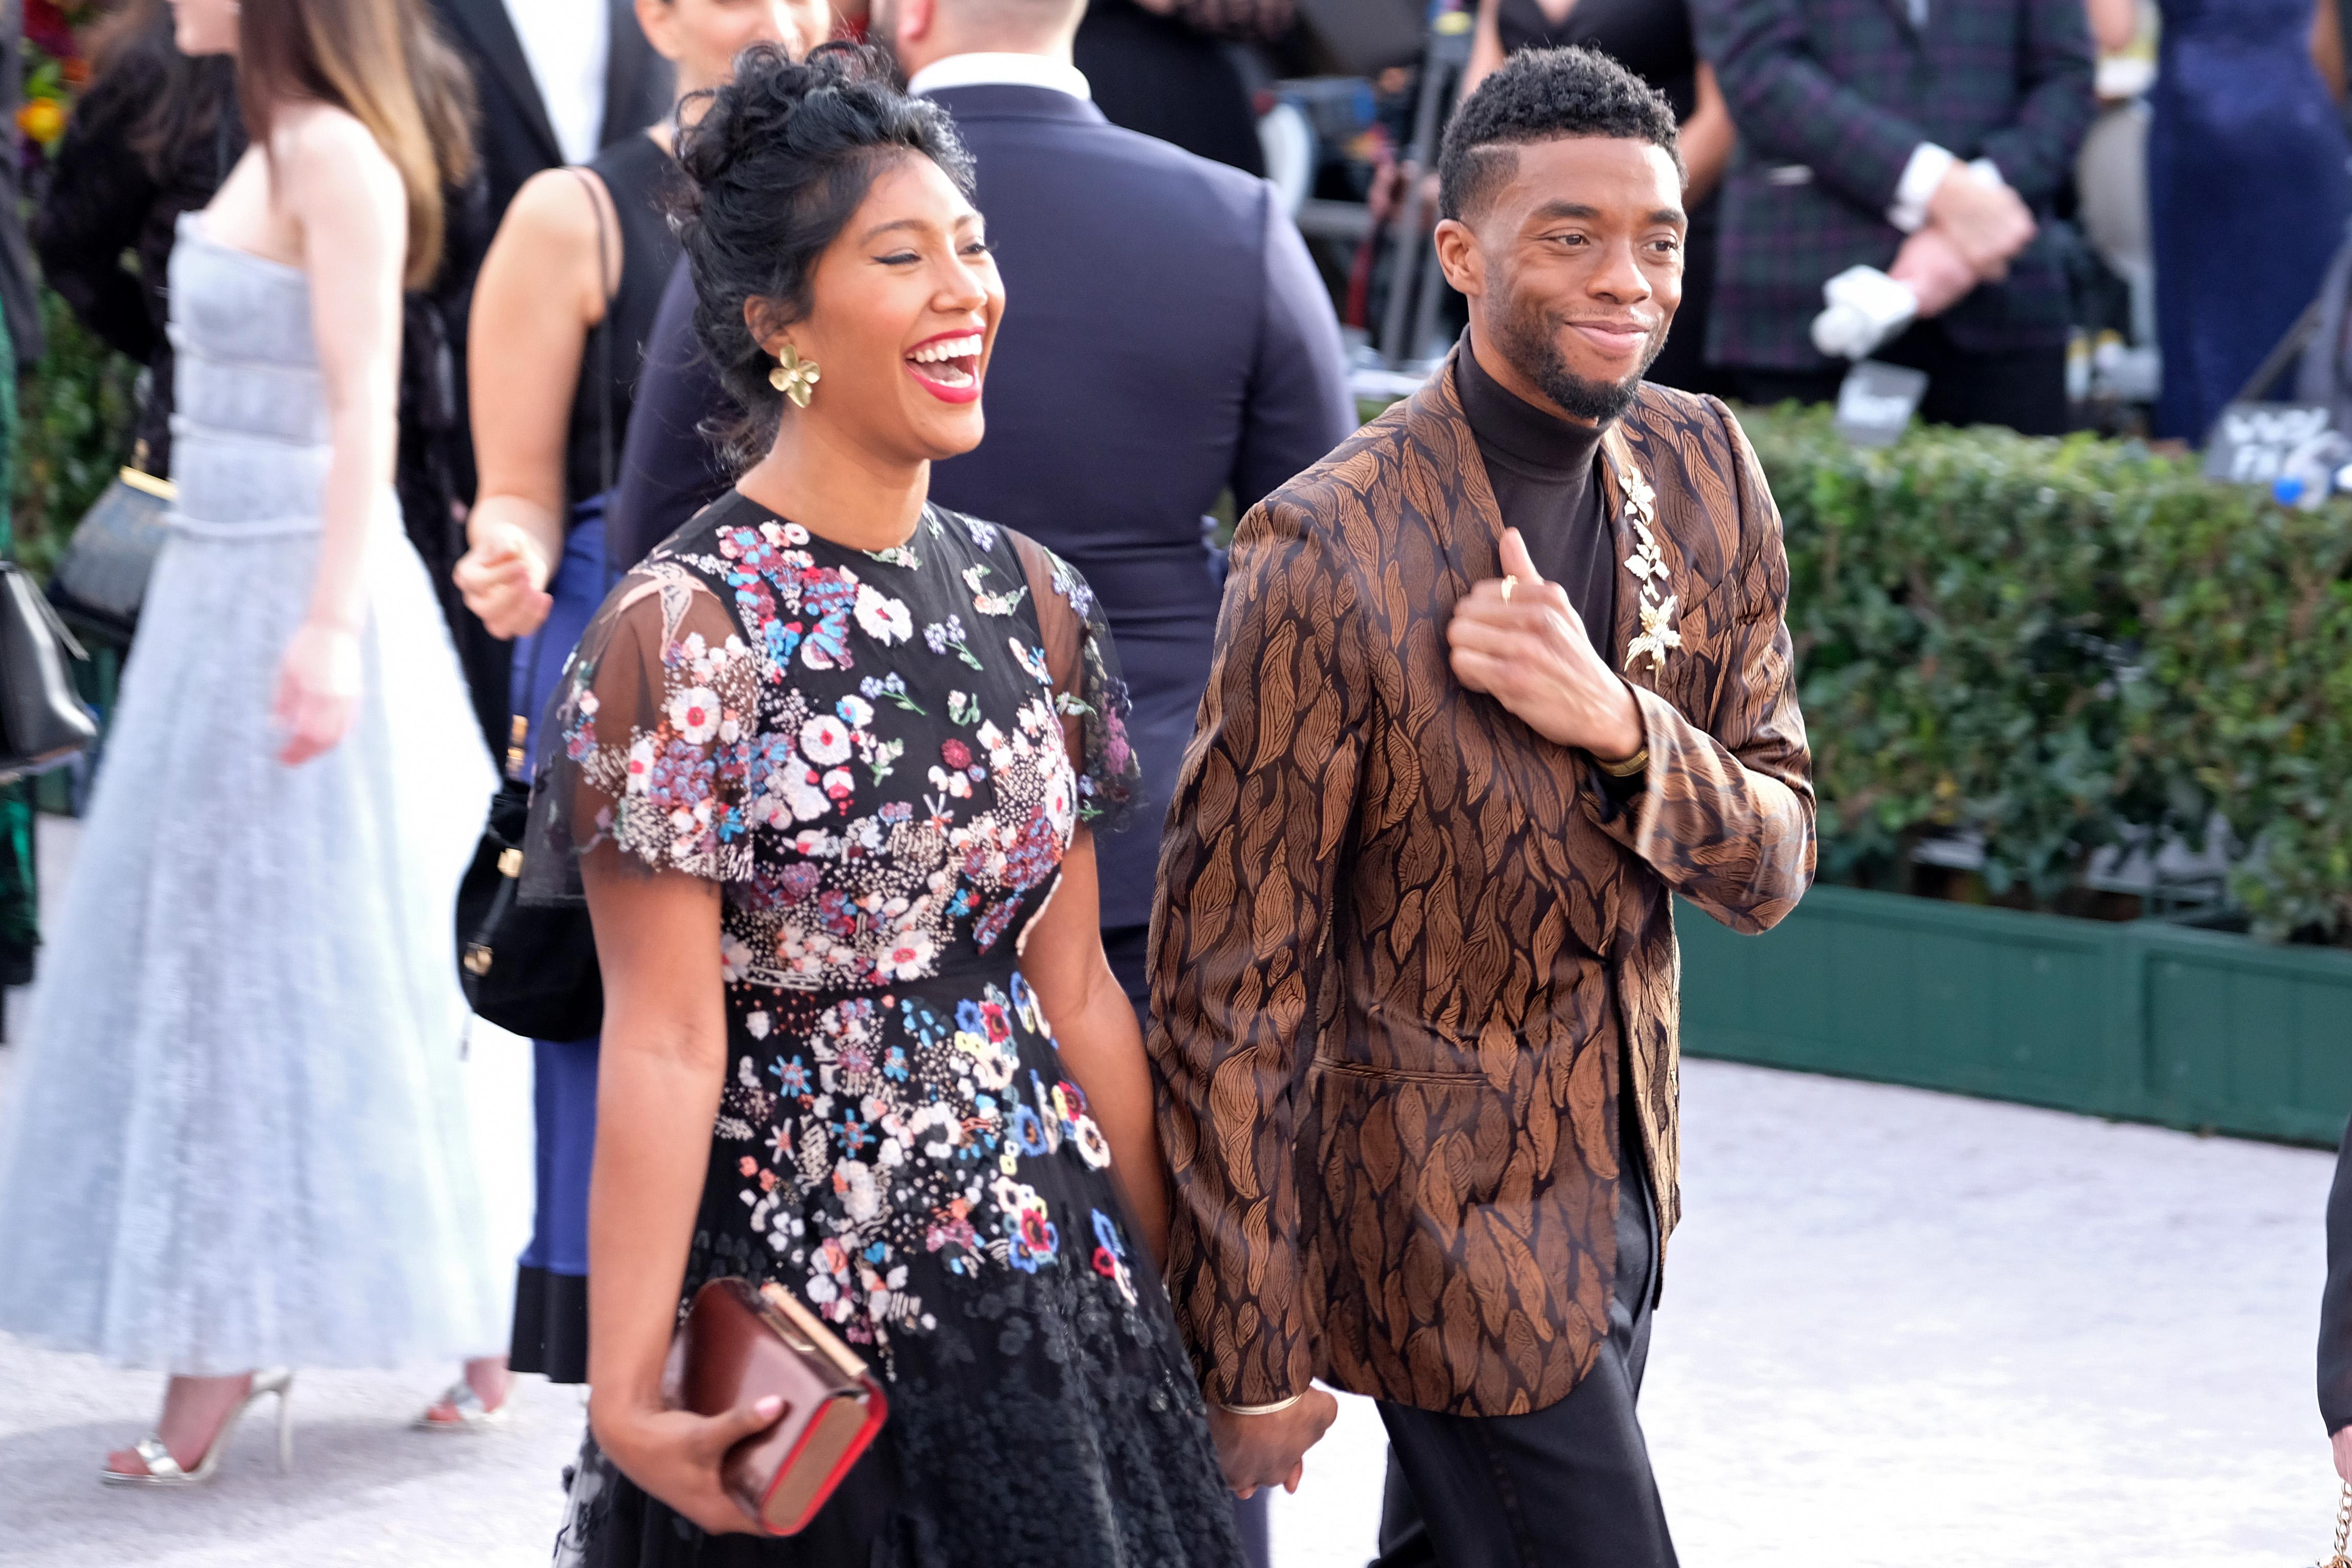 Chadwick Boseman And Taylor Simone Ledward: Their Love In Pics thumbnail